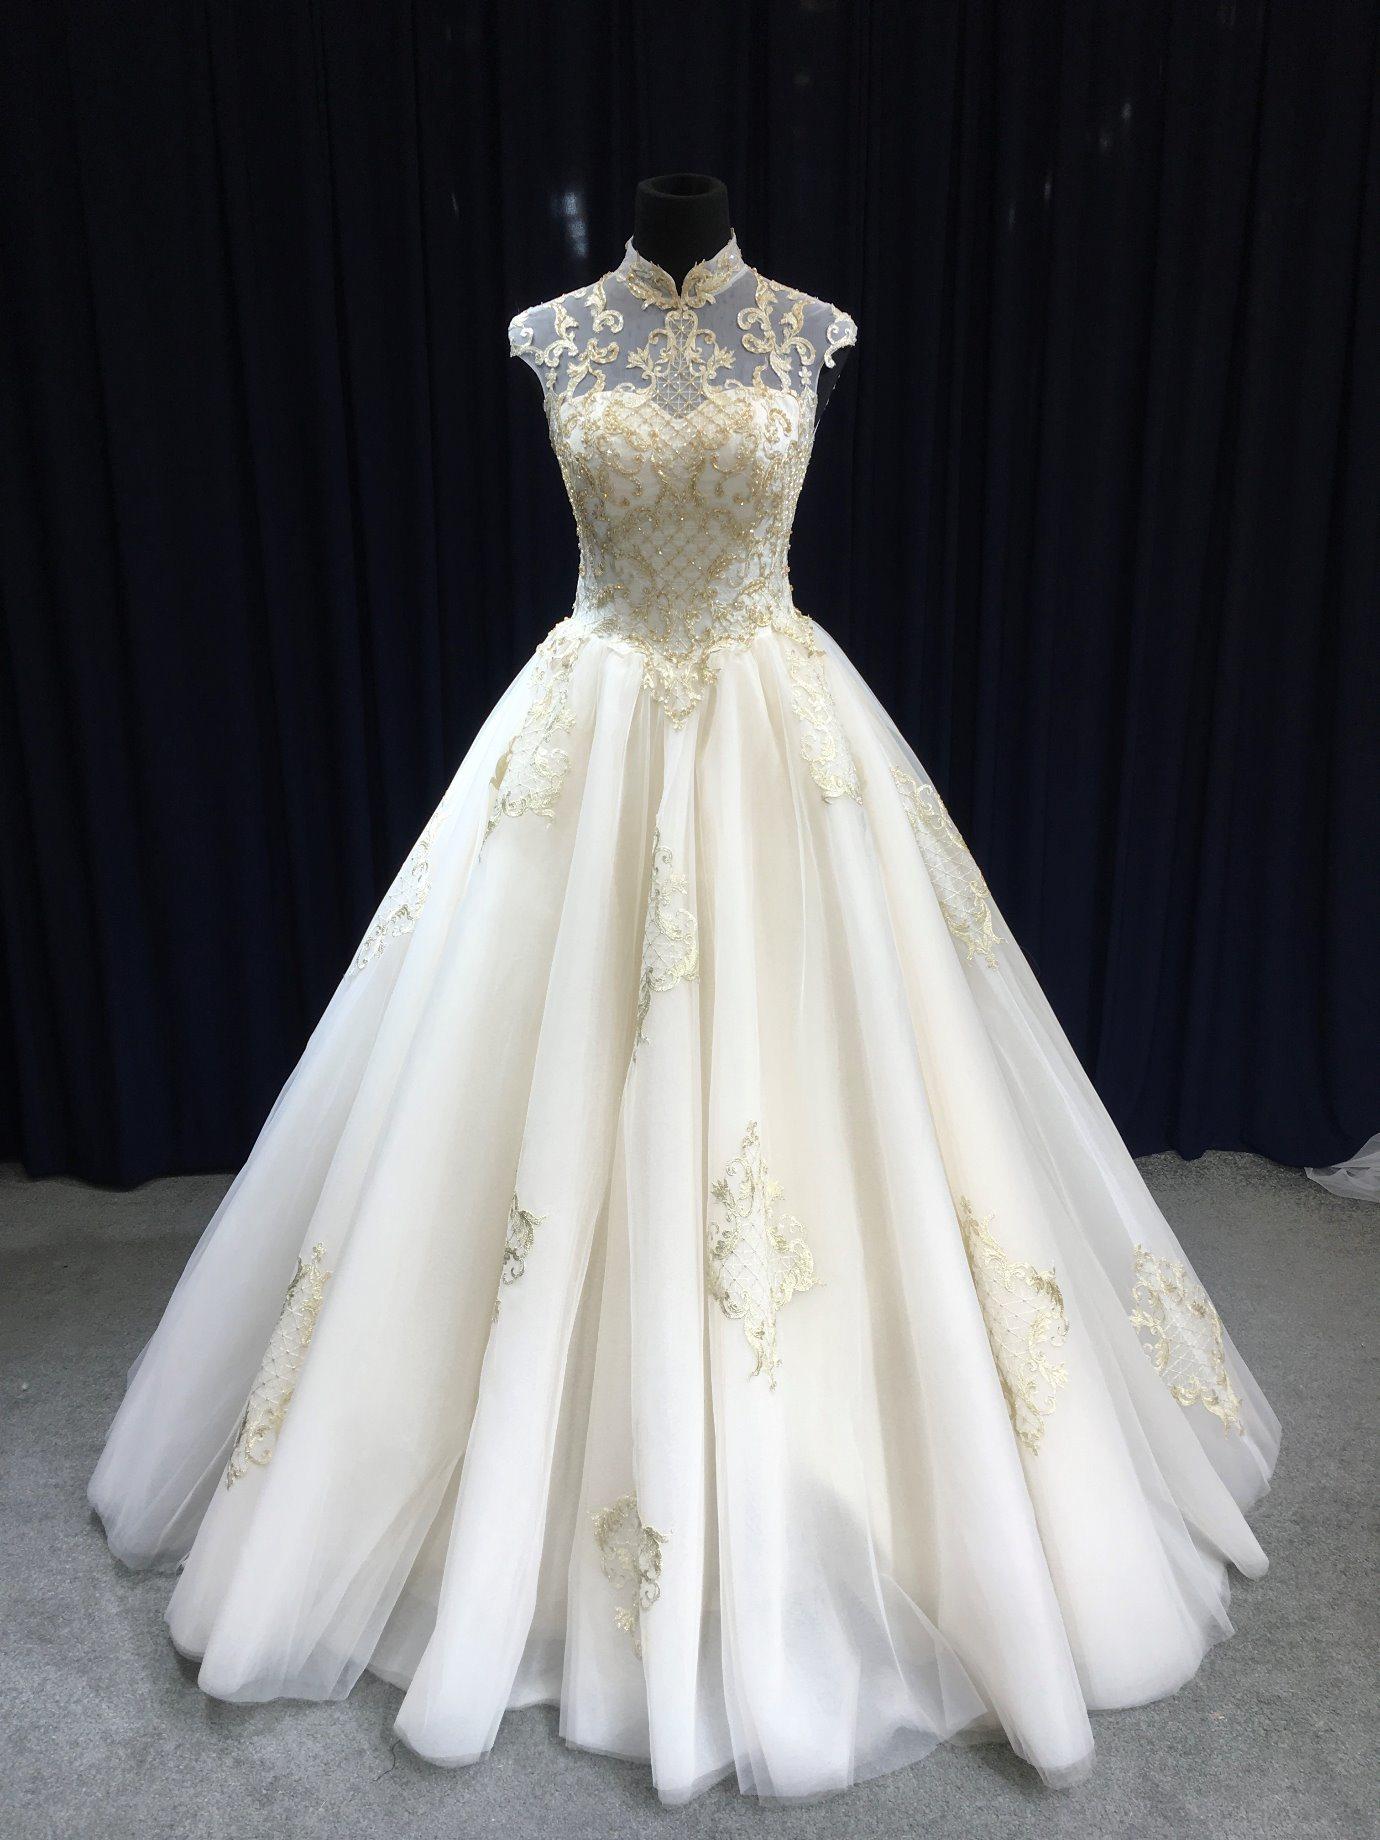 China Aoliweiya Golden Appliques High Neck Glass Beading Wedding Dress: Gold Applique Wedding Dress At Reisefeber.org